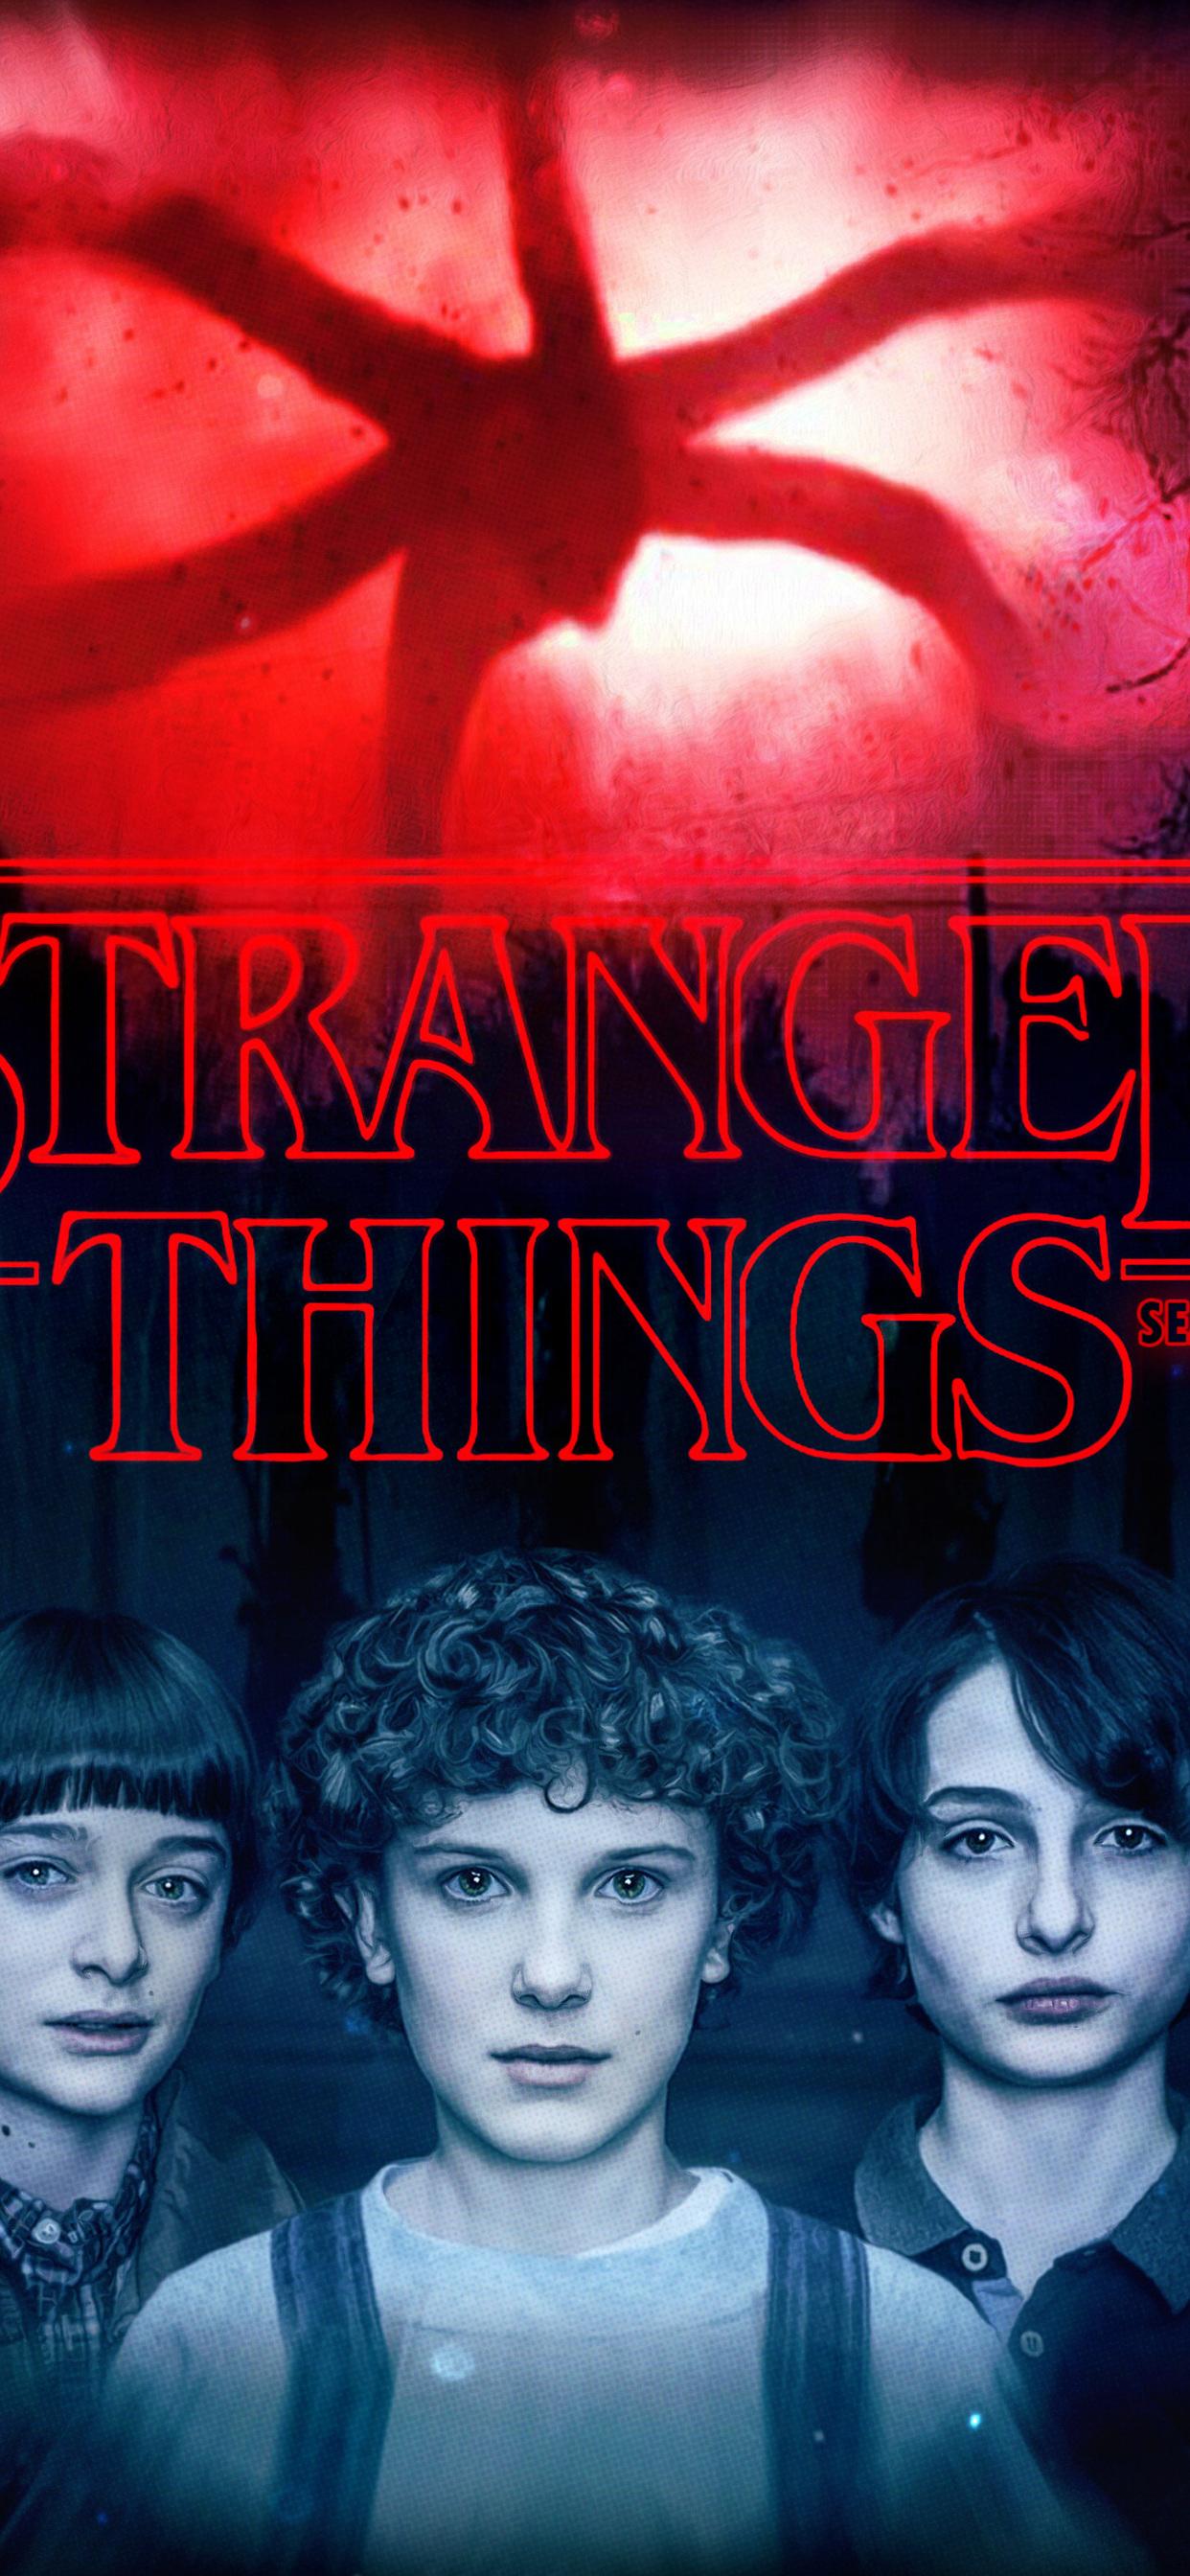 1242x2688 Stranger Things Season 2 2017 Poster Iphone Xs Max Hd 4k